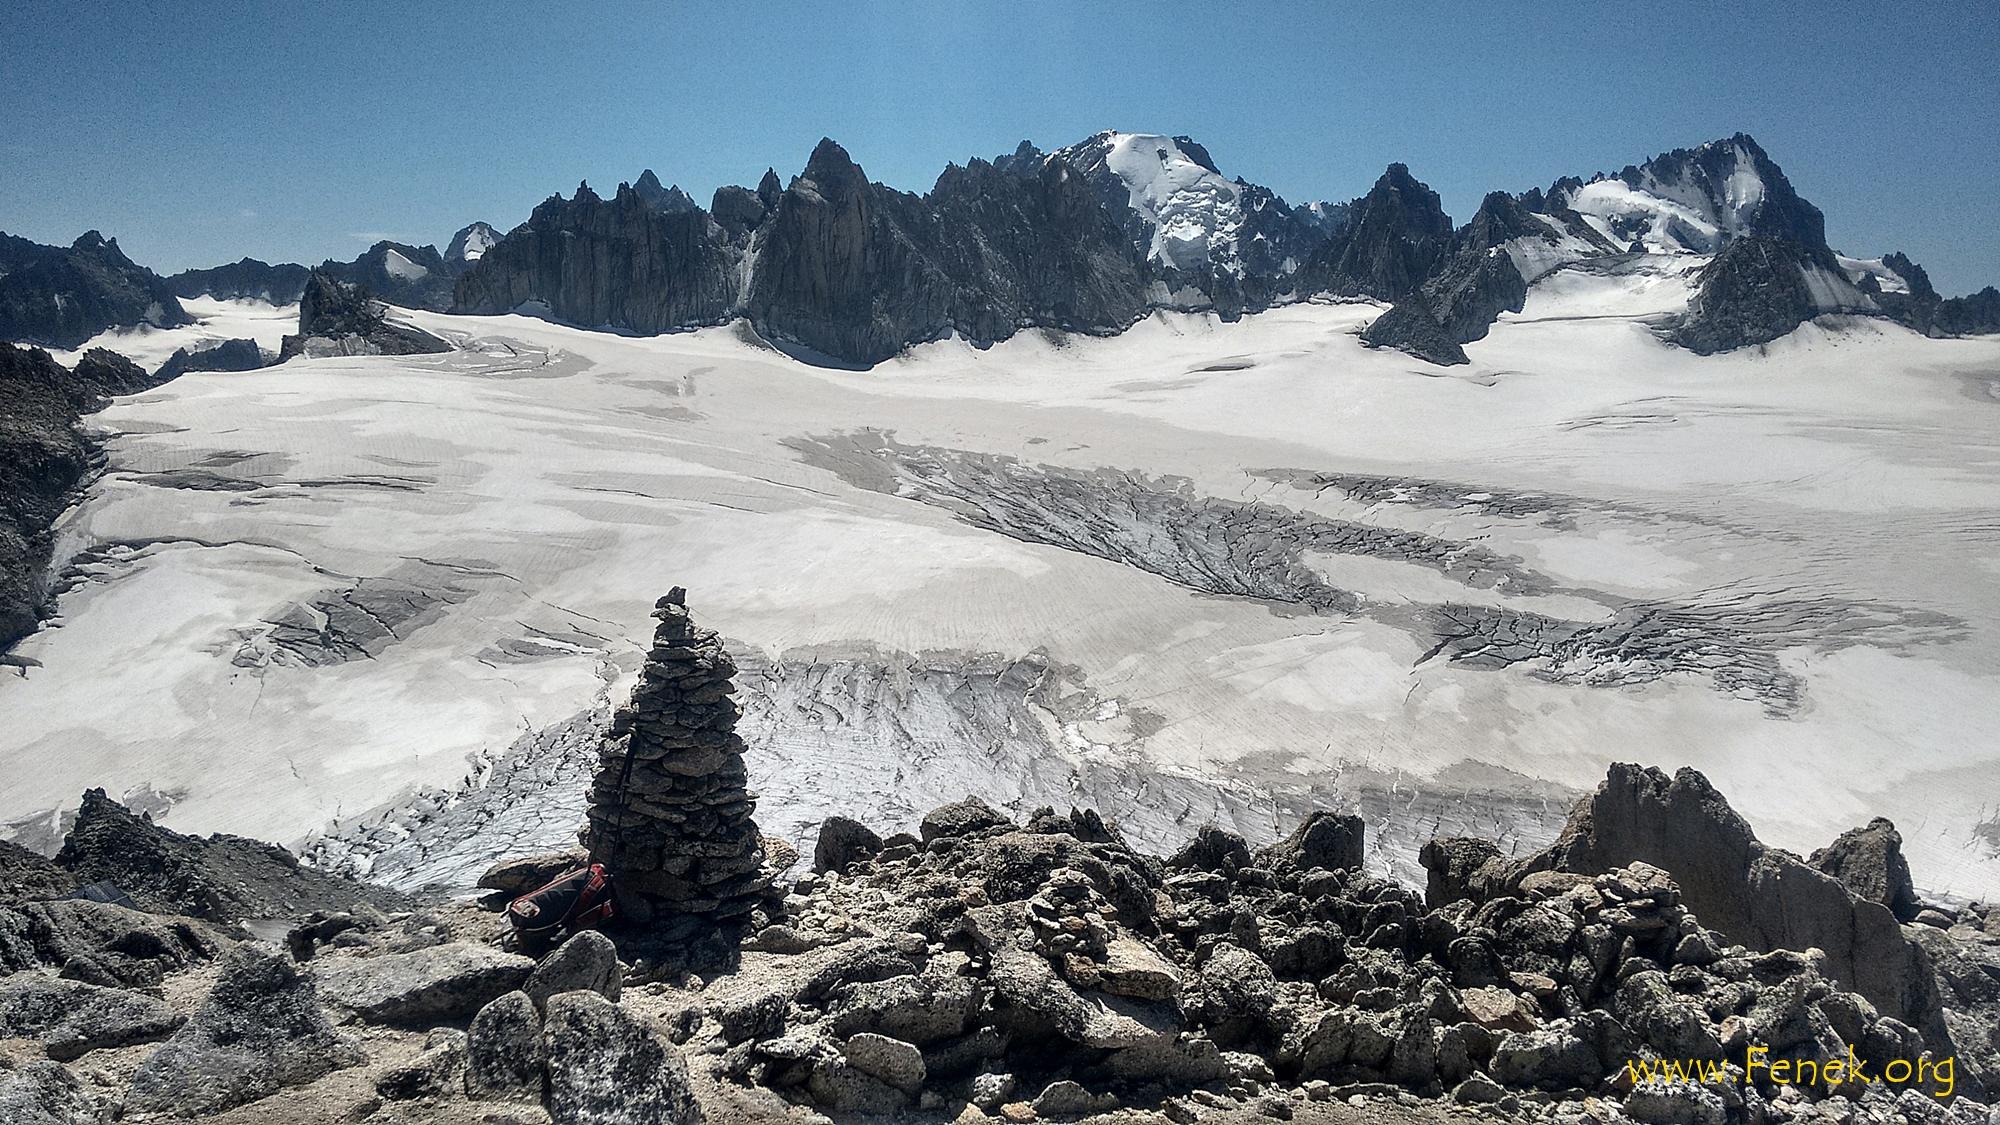 Gipfelaussicht Pointe d'Orny